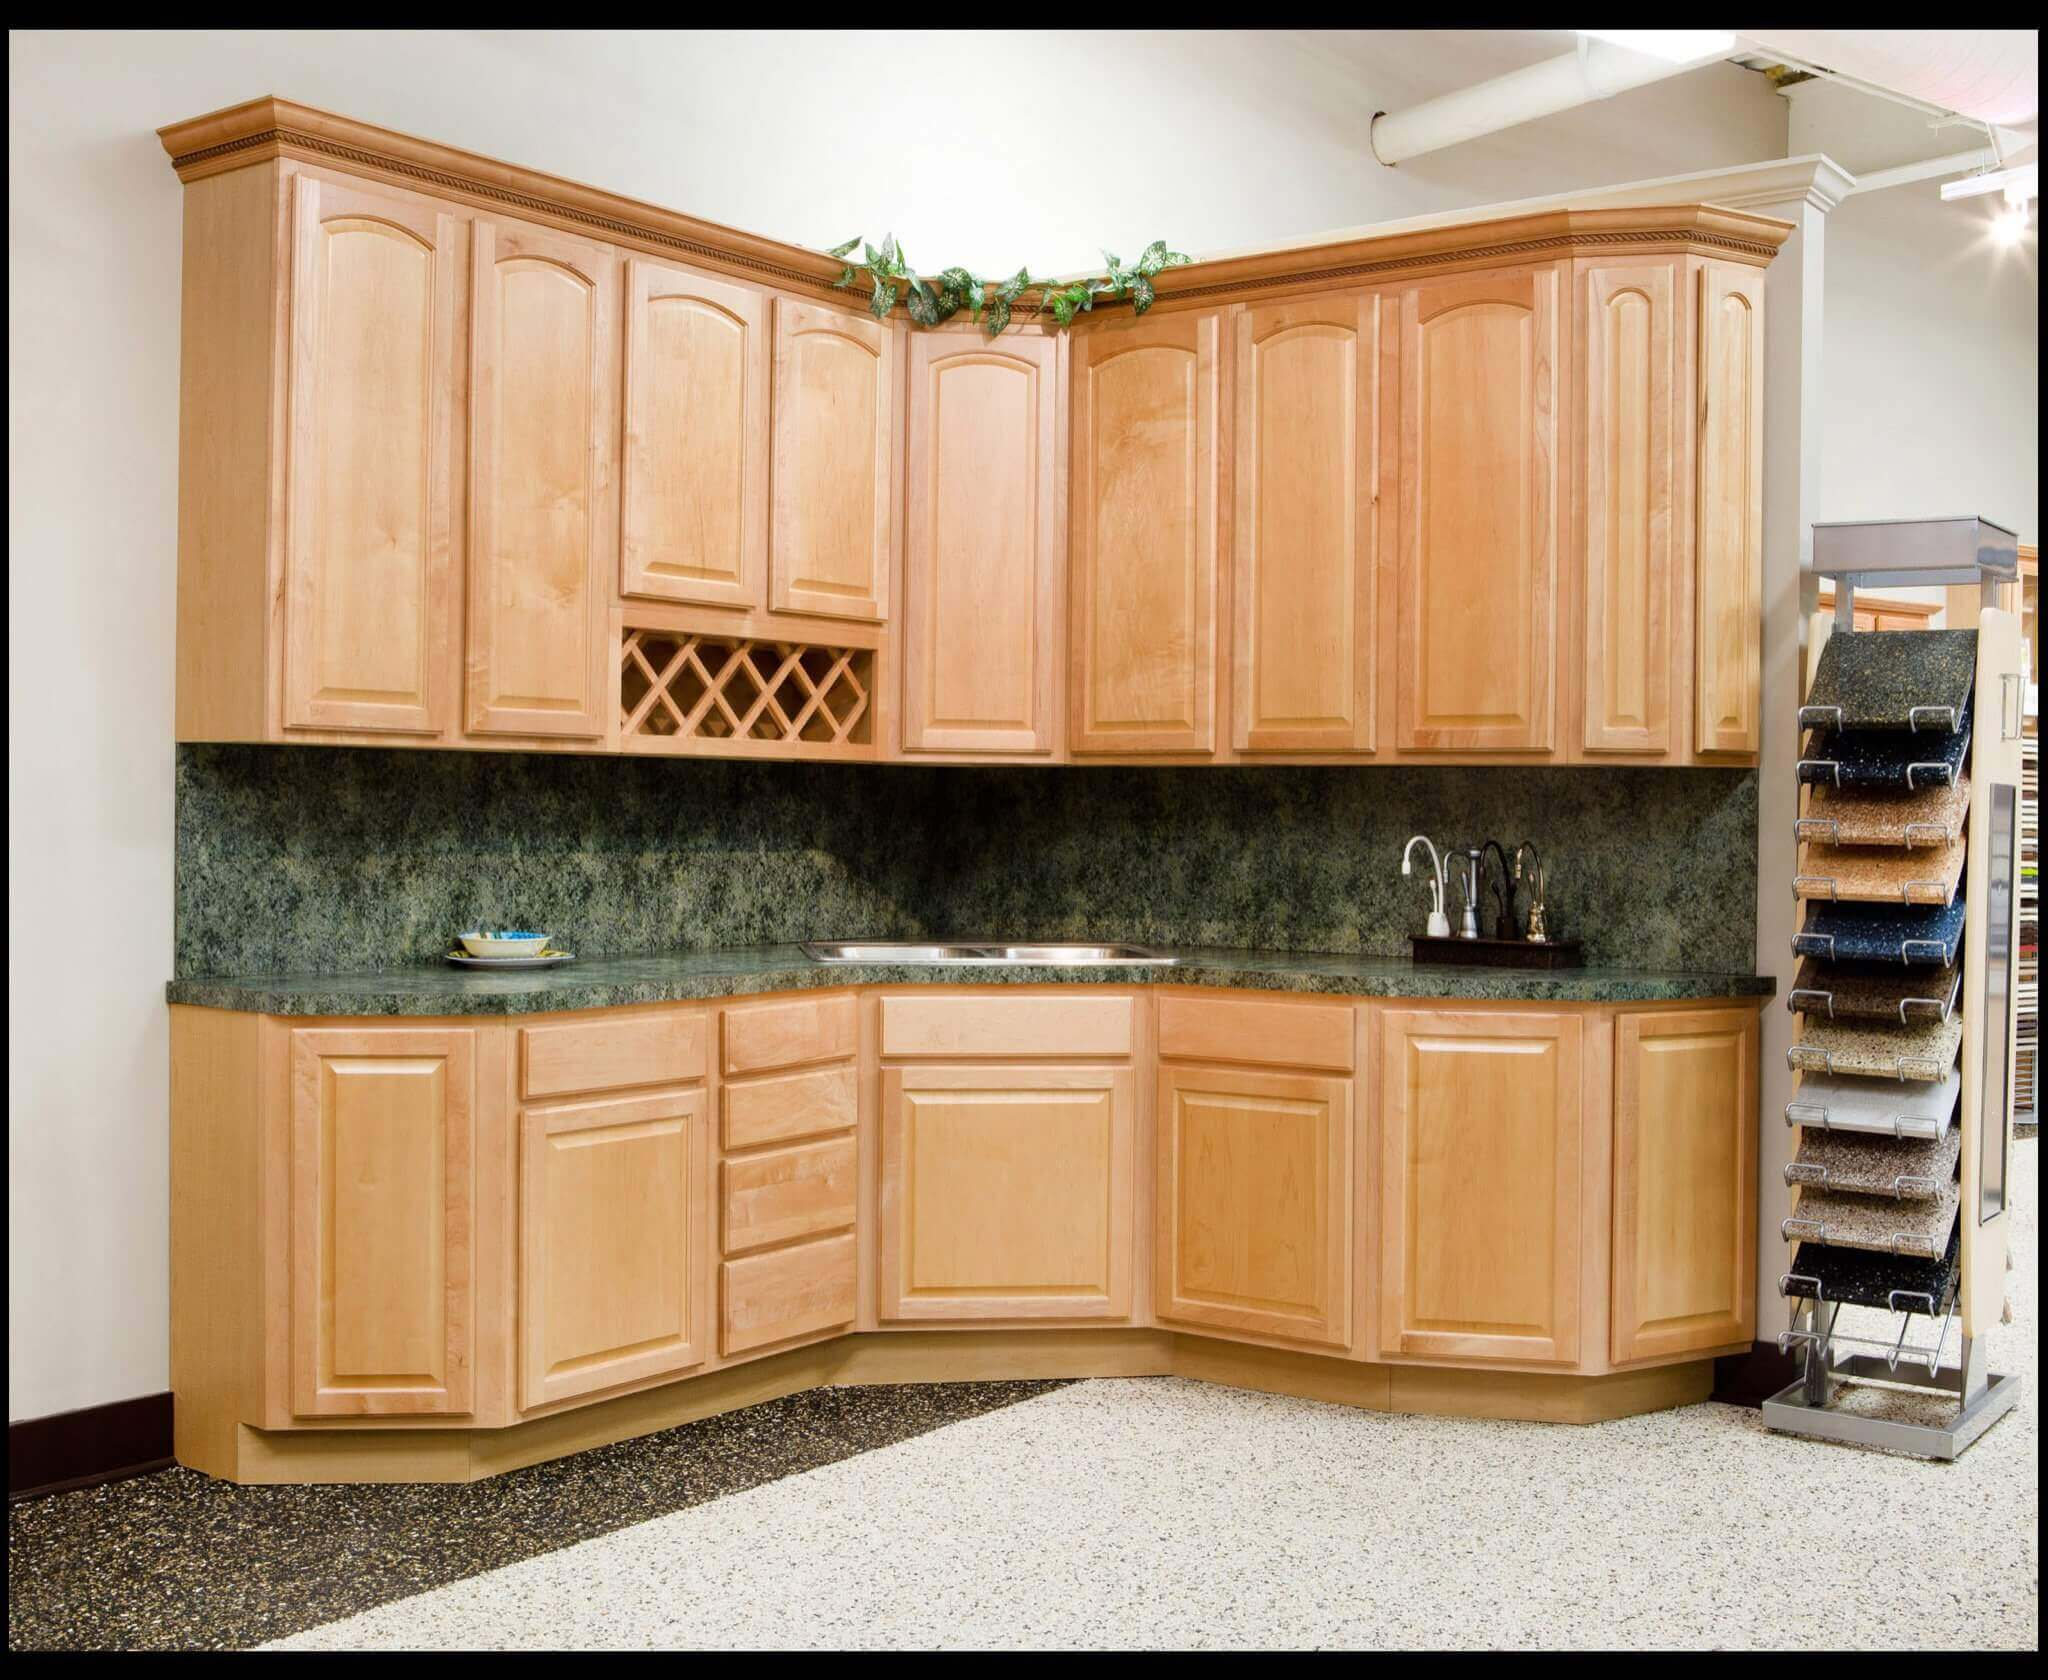 Alno kitchen cabinets chicago - Virtual Showroom Tour